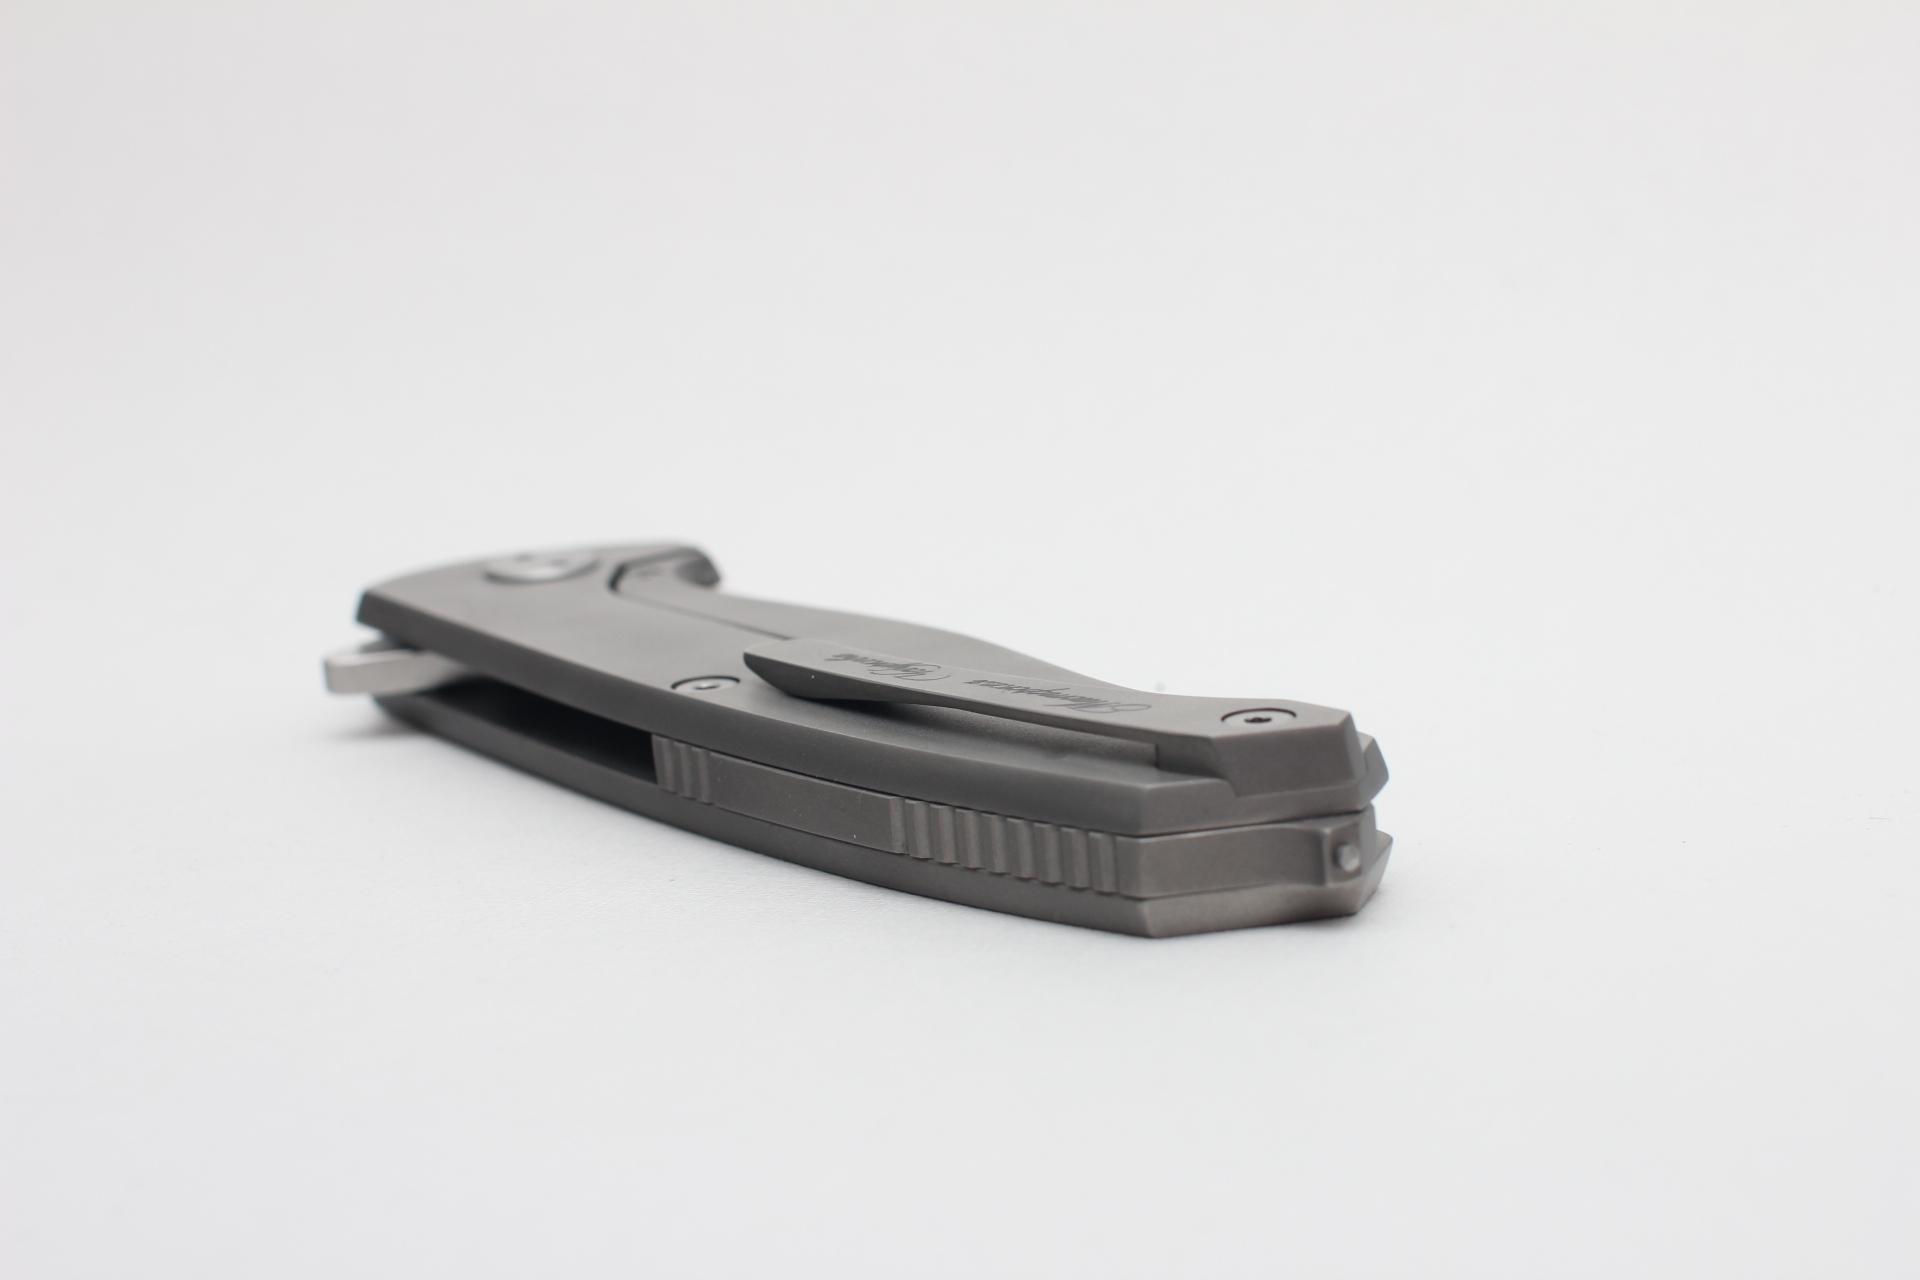 Нож Чебуркова Волк М390 Титан лимитированный - фотография